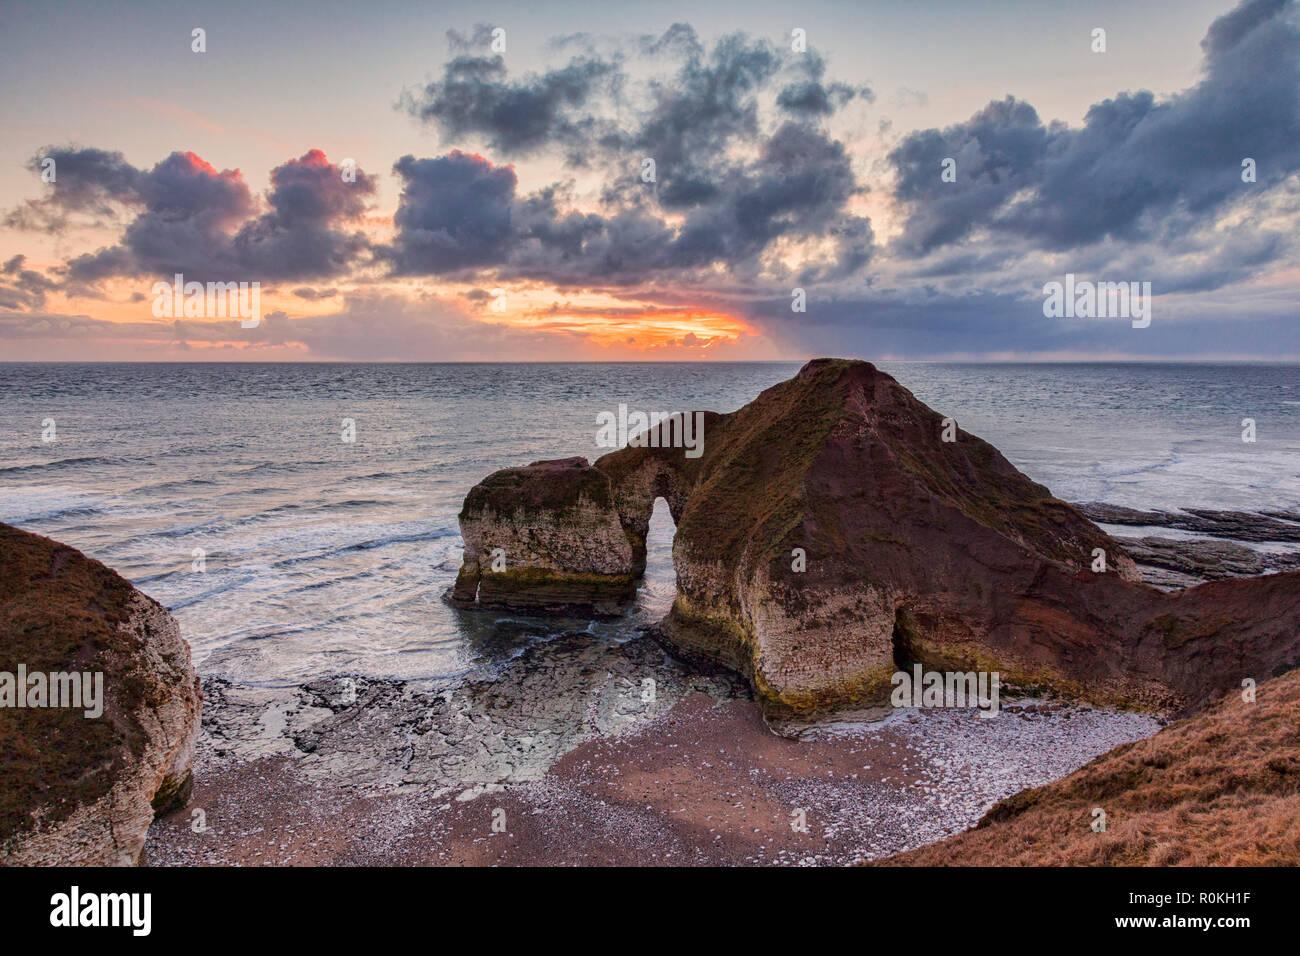 Limestone rock formation known as the Dinosaur, Flamborough Head, East Yorkshire, England, UK. - Stock Image